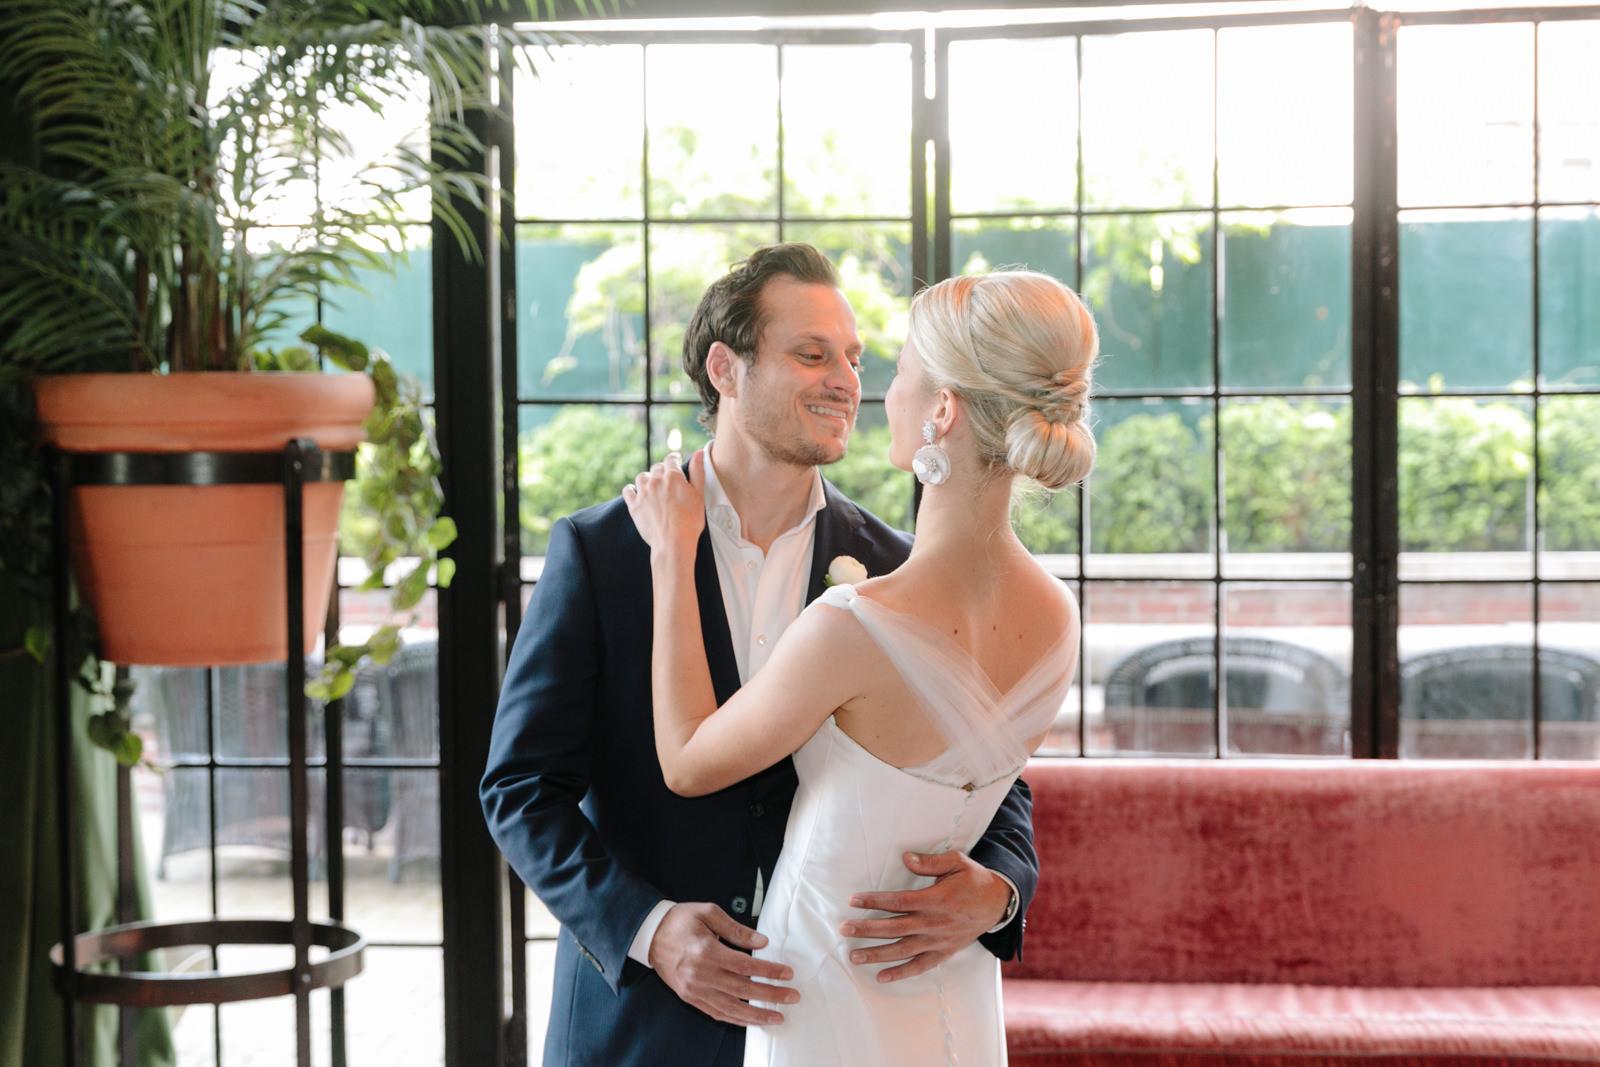 Intimate-NYC_wedding_ by Tanya Isaeva-67.jpg